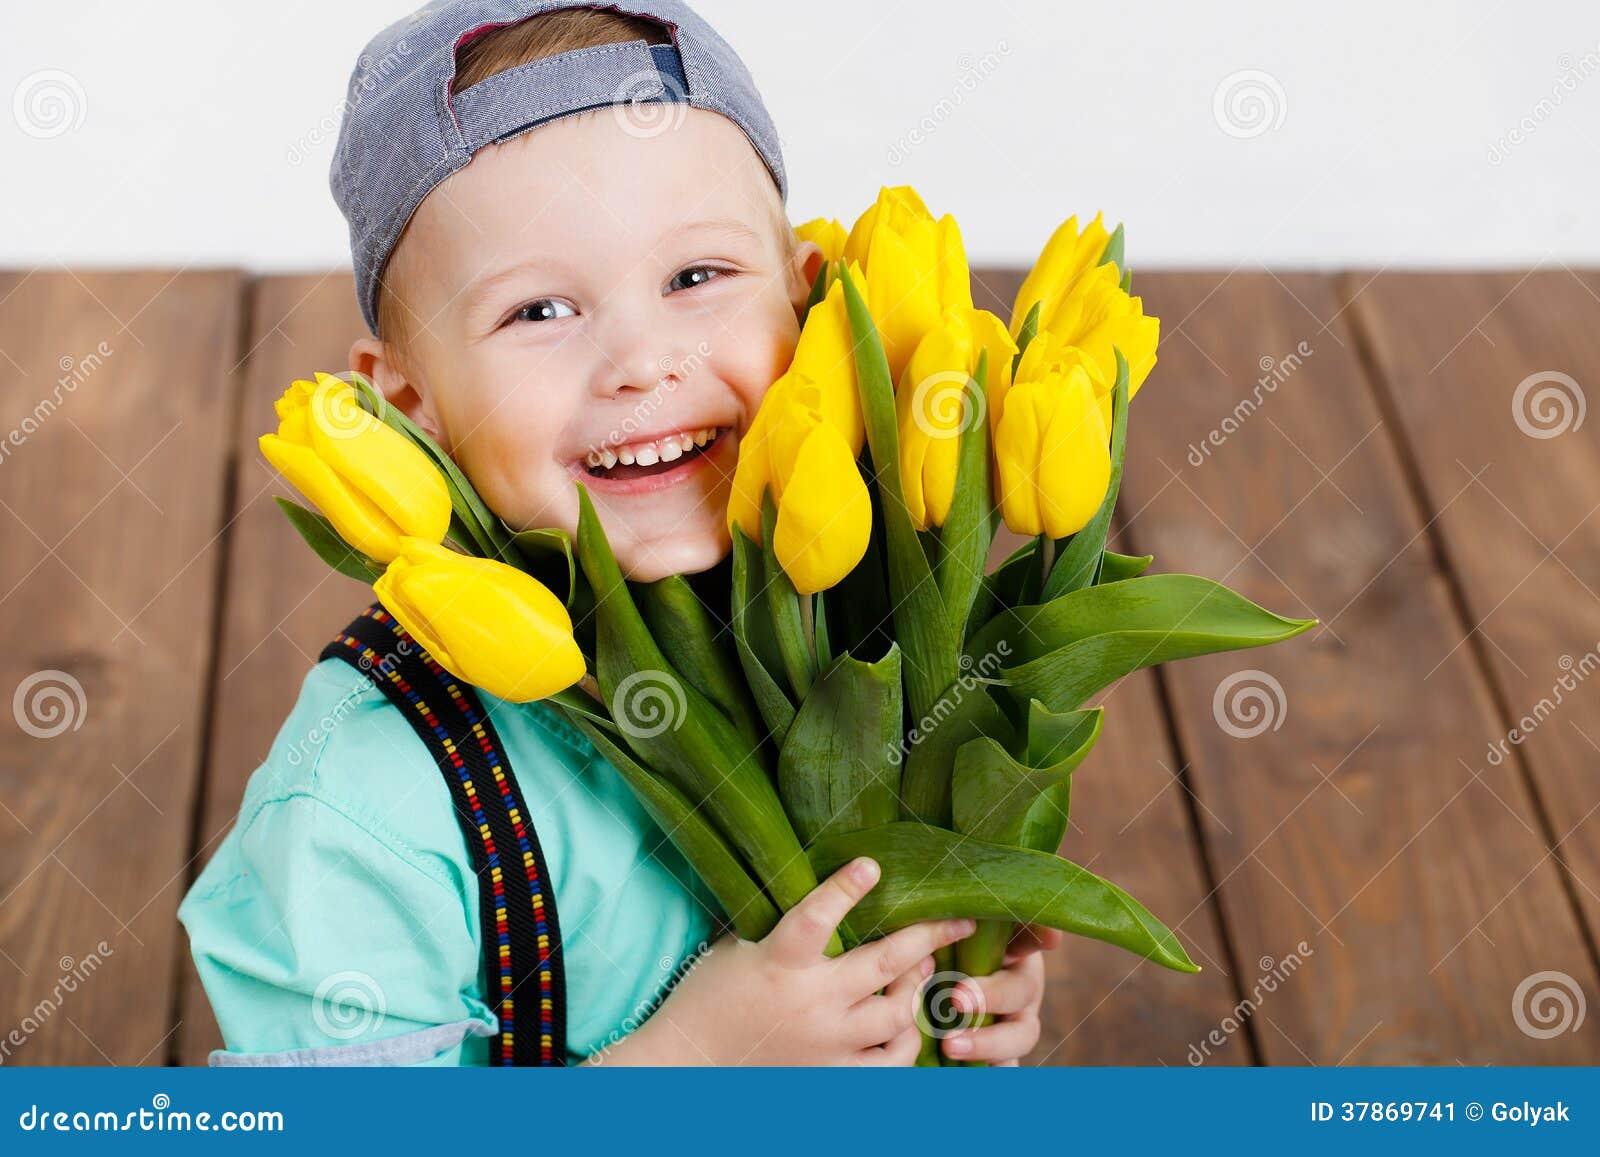 Дарят ли на свадьбу цветы: какие и 34